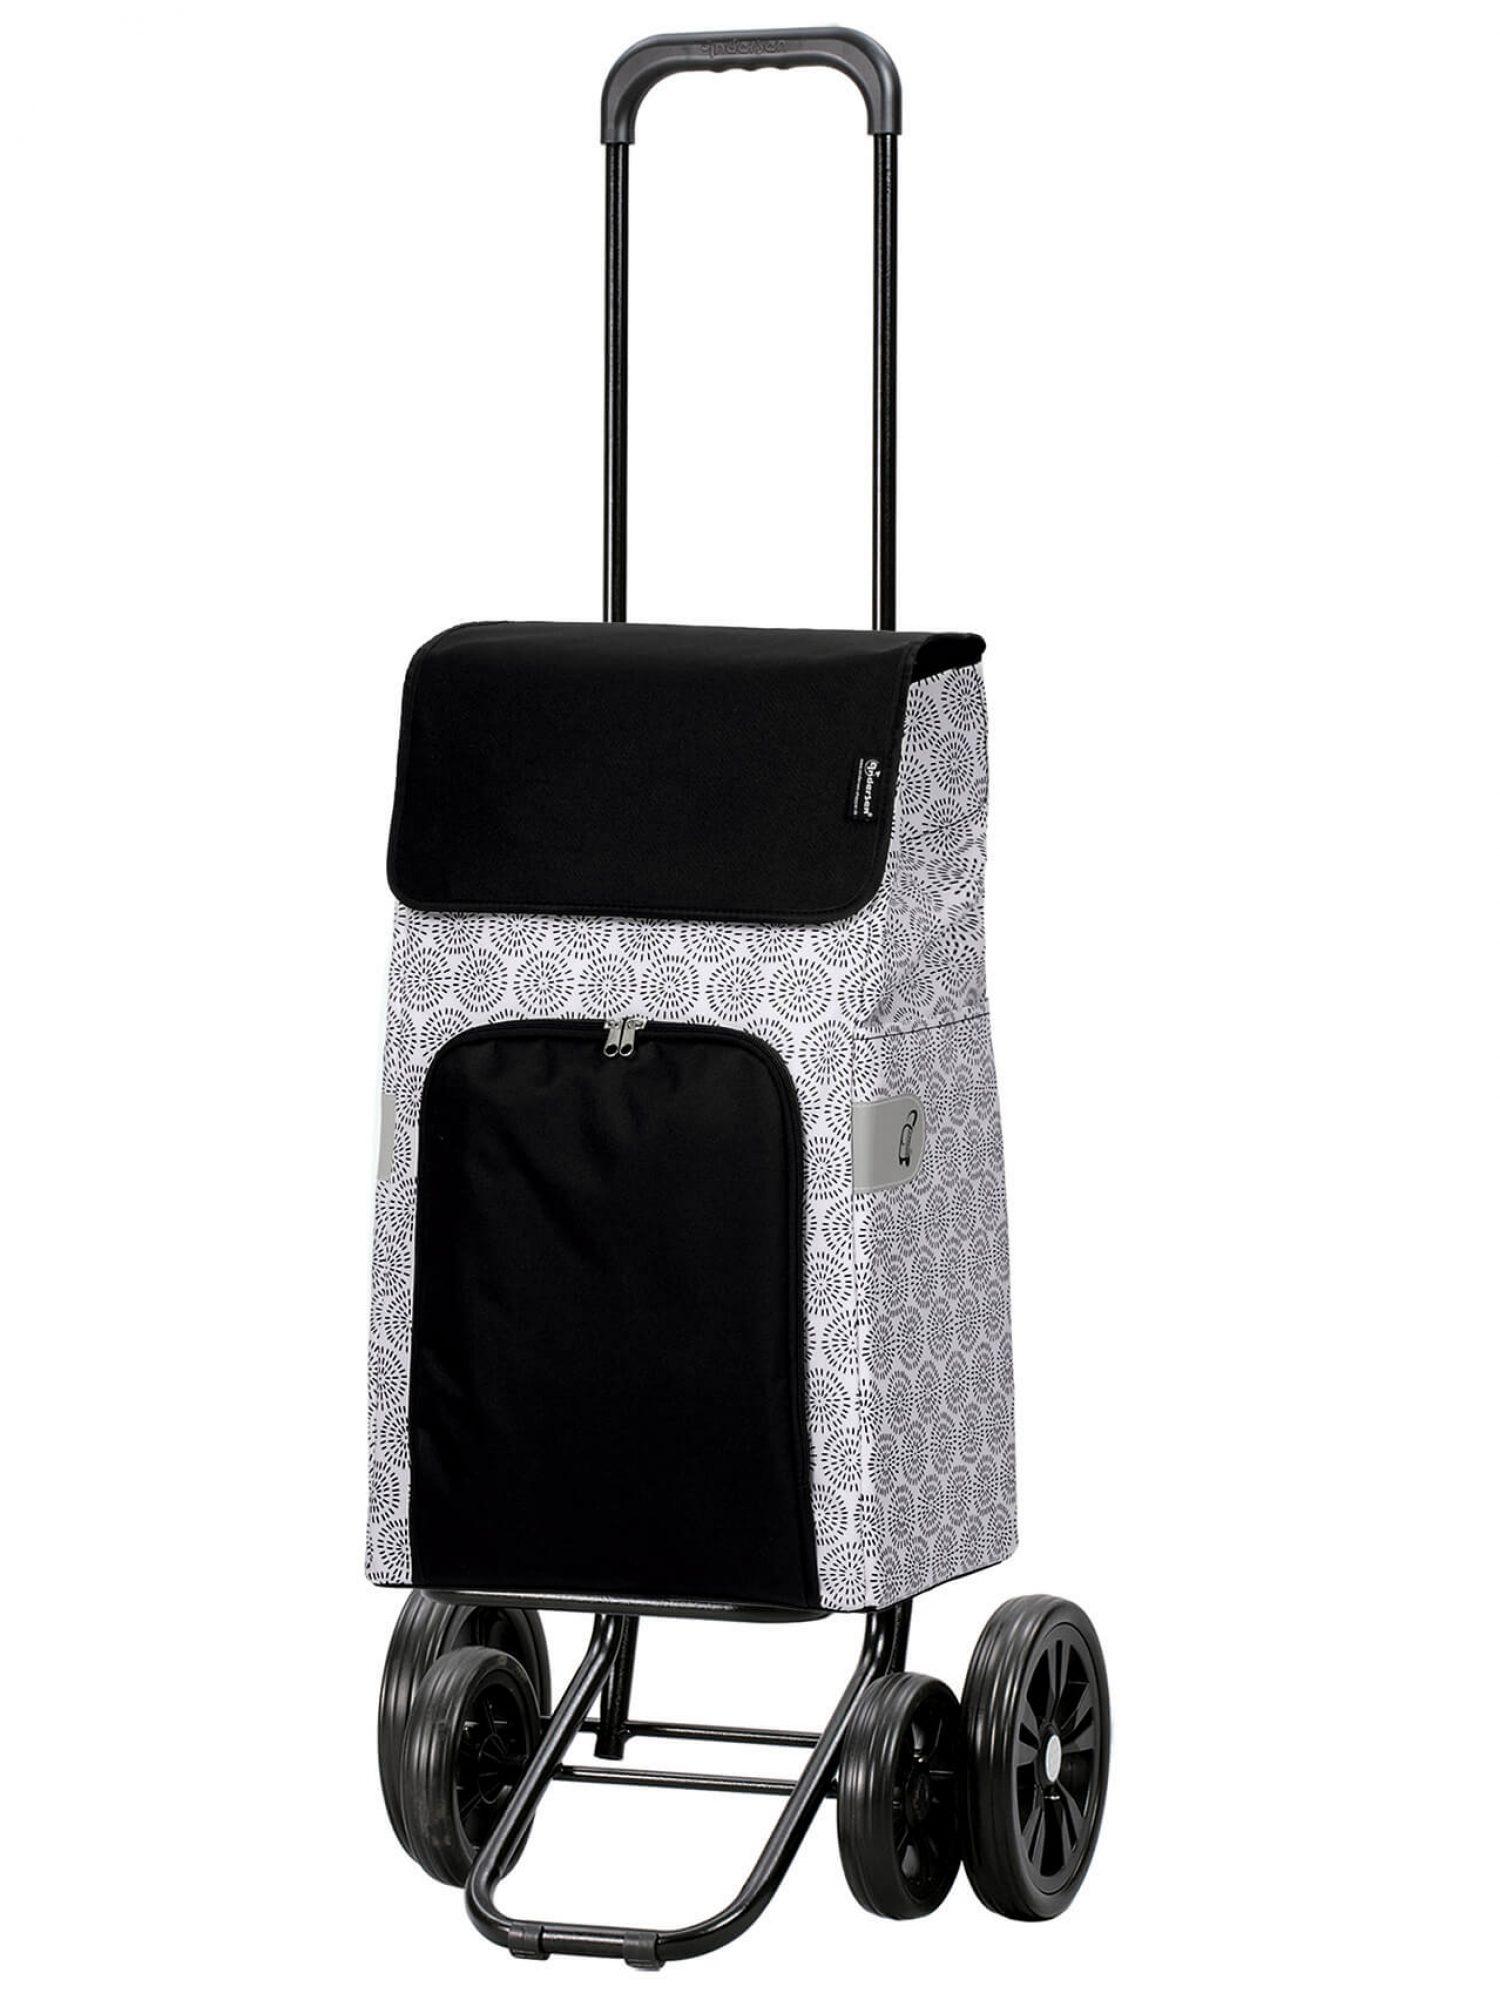 9d48762d71 Quattro frame with Henni bag Shopping Trolley